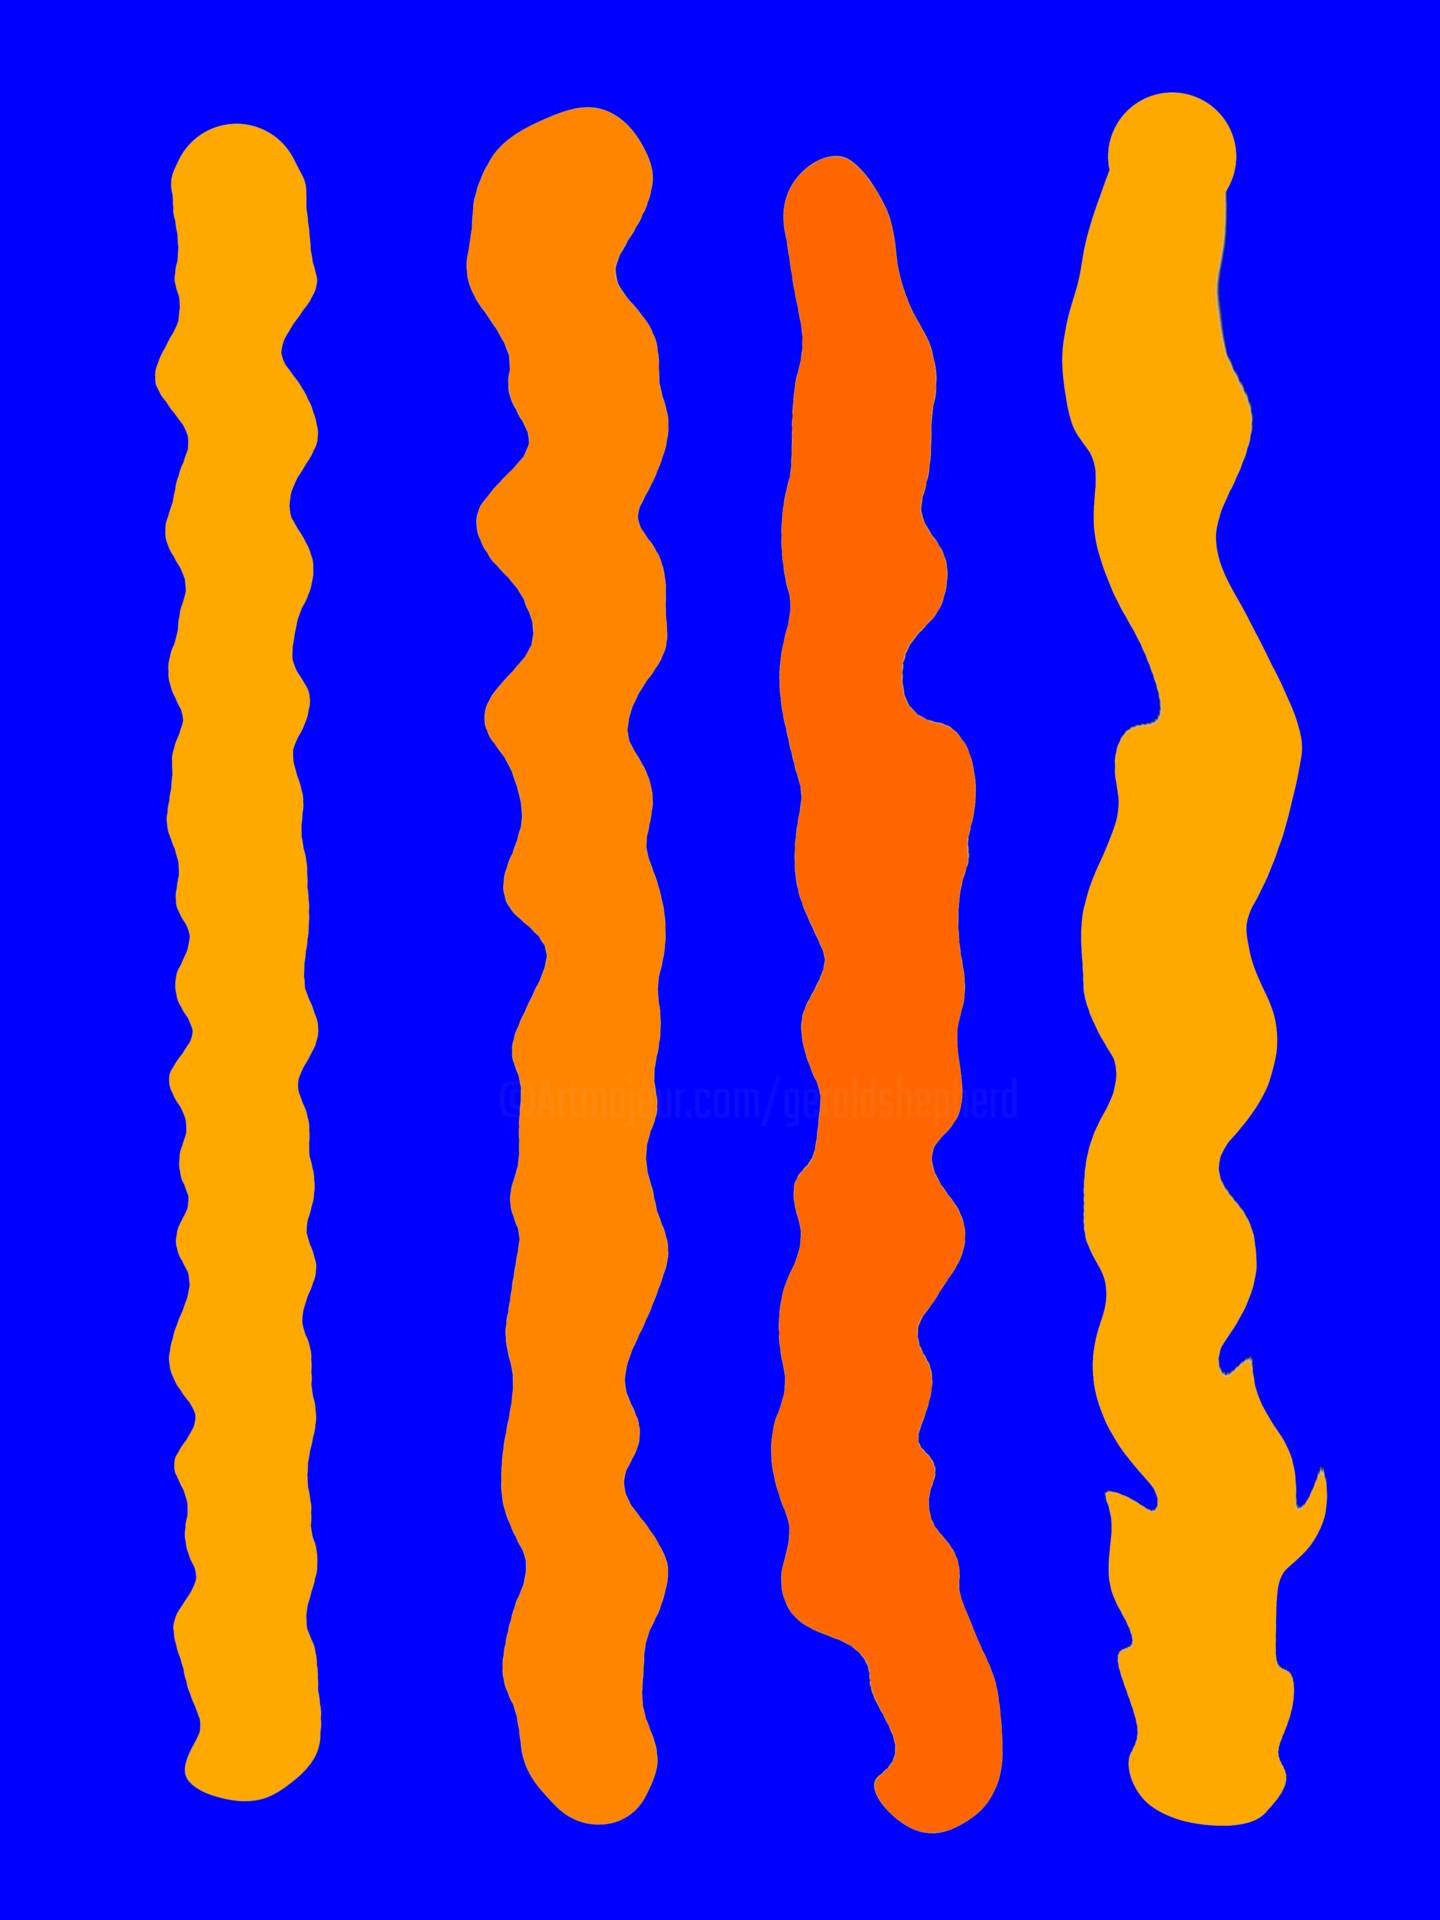 Gerald Shepherd - Altered Lines Variation